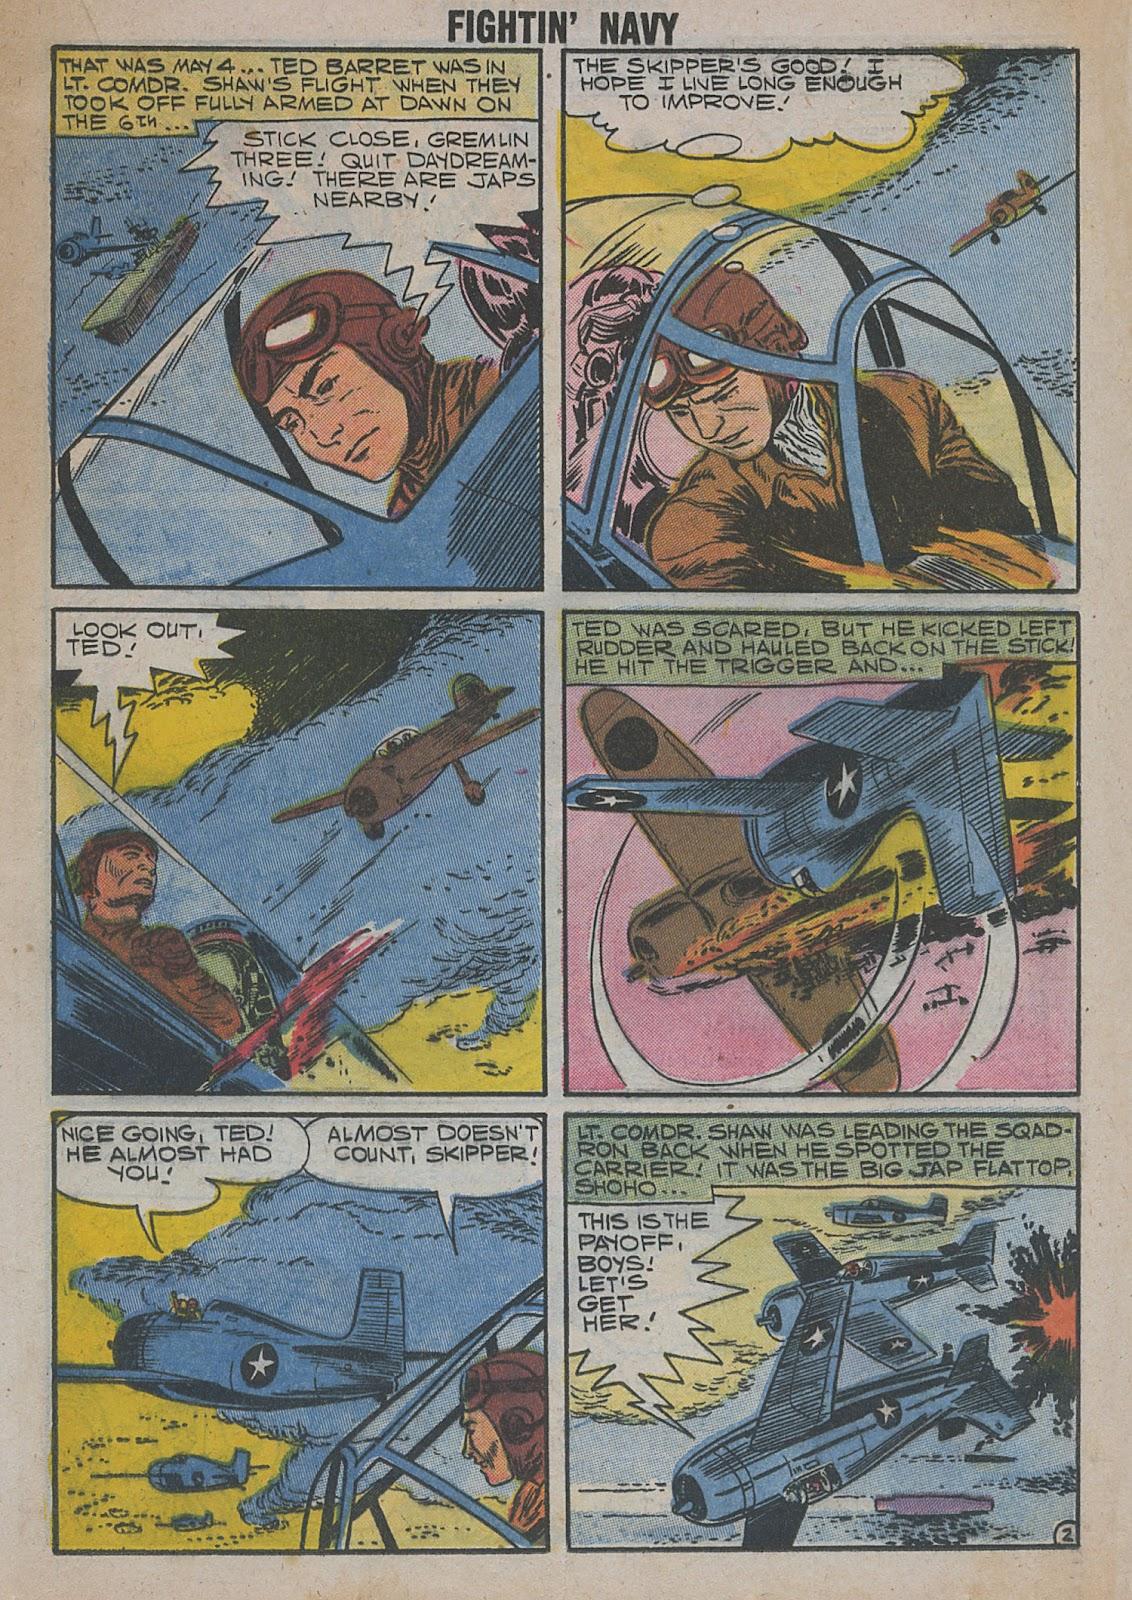 Read online Fightin' Navy comic -  Issue #82 - 39